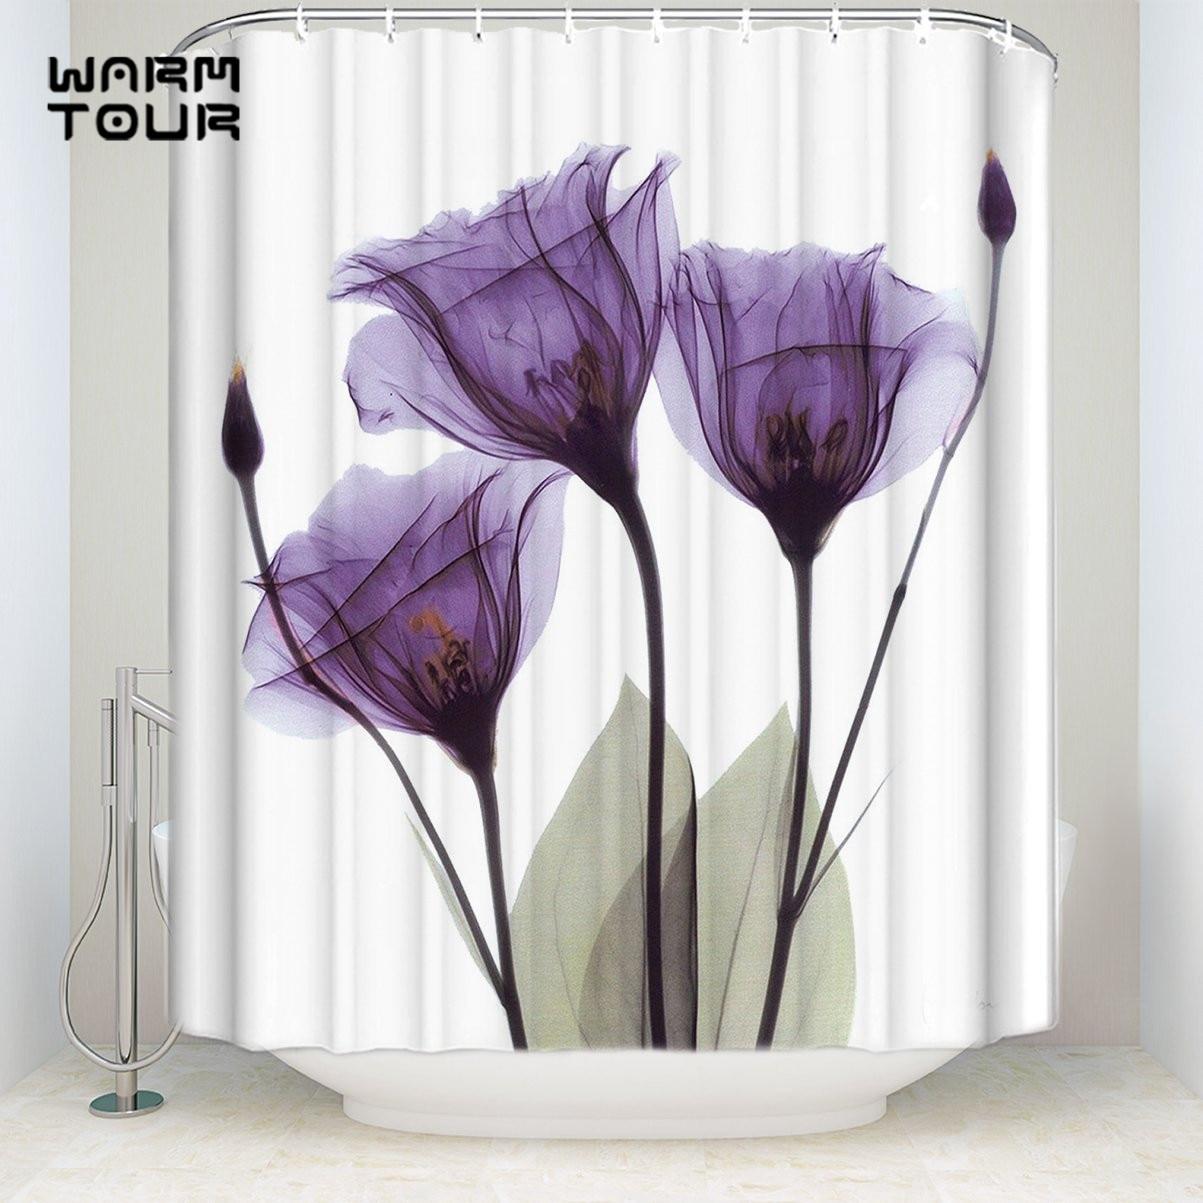 Bath Shower Curtains Home Decoration Contemporary Elegant Lavender Hope Flowers Mildew-resistant Bathroom Sets with Hooks